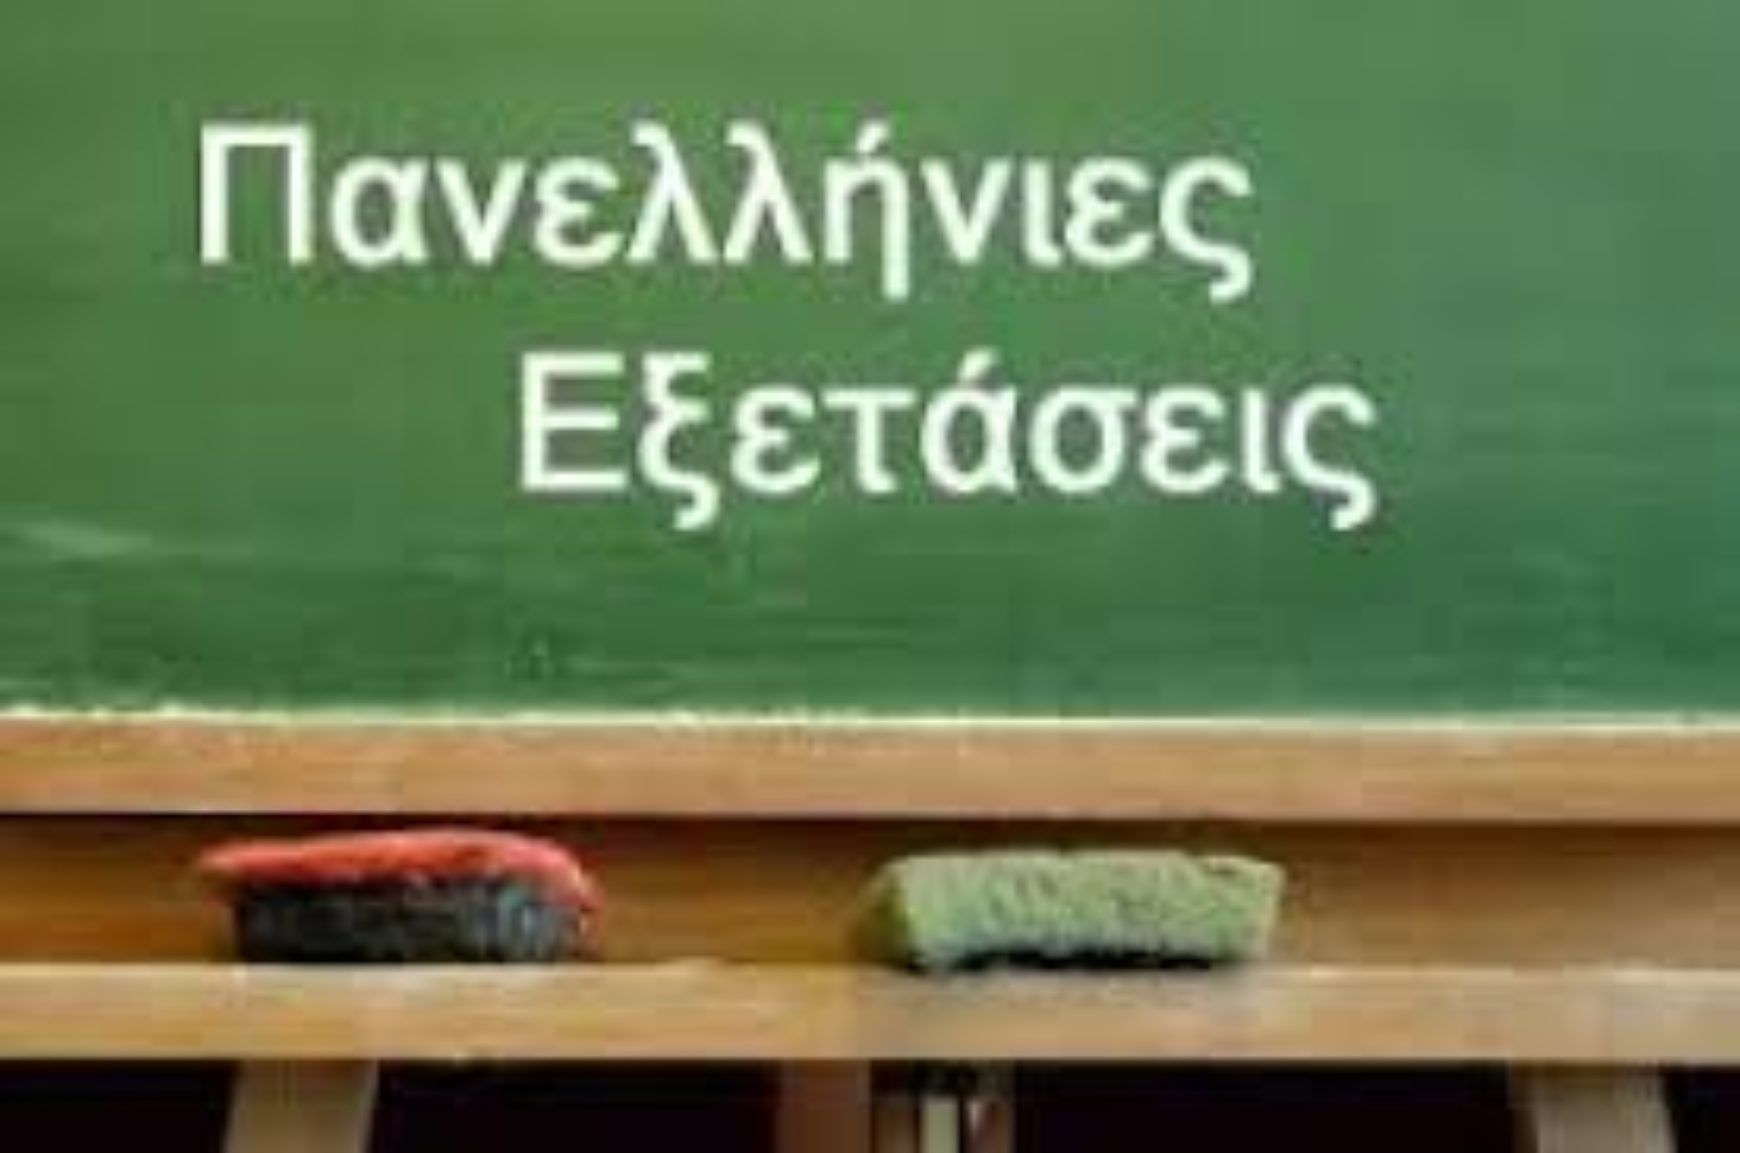 ANAKOINΩΣΗ ΓΙΑ ΠΑΝΕΛΛΑΔΙΚΕΣ ΕΞΕΤΑΣΕΙΣ